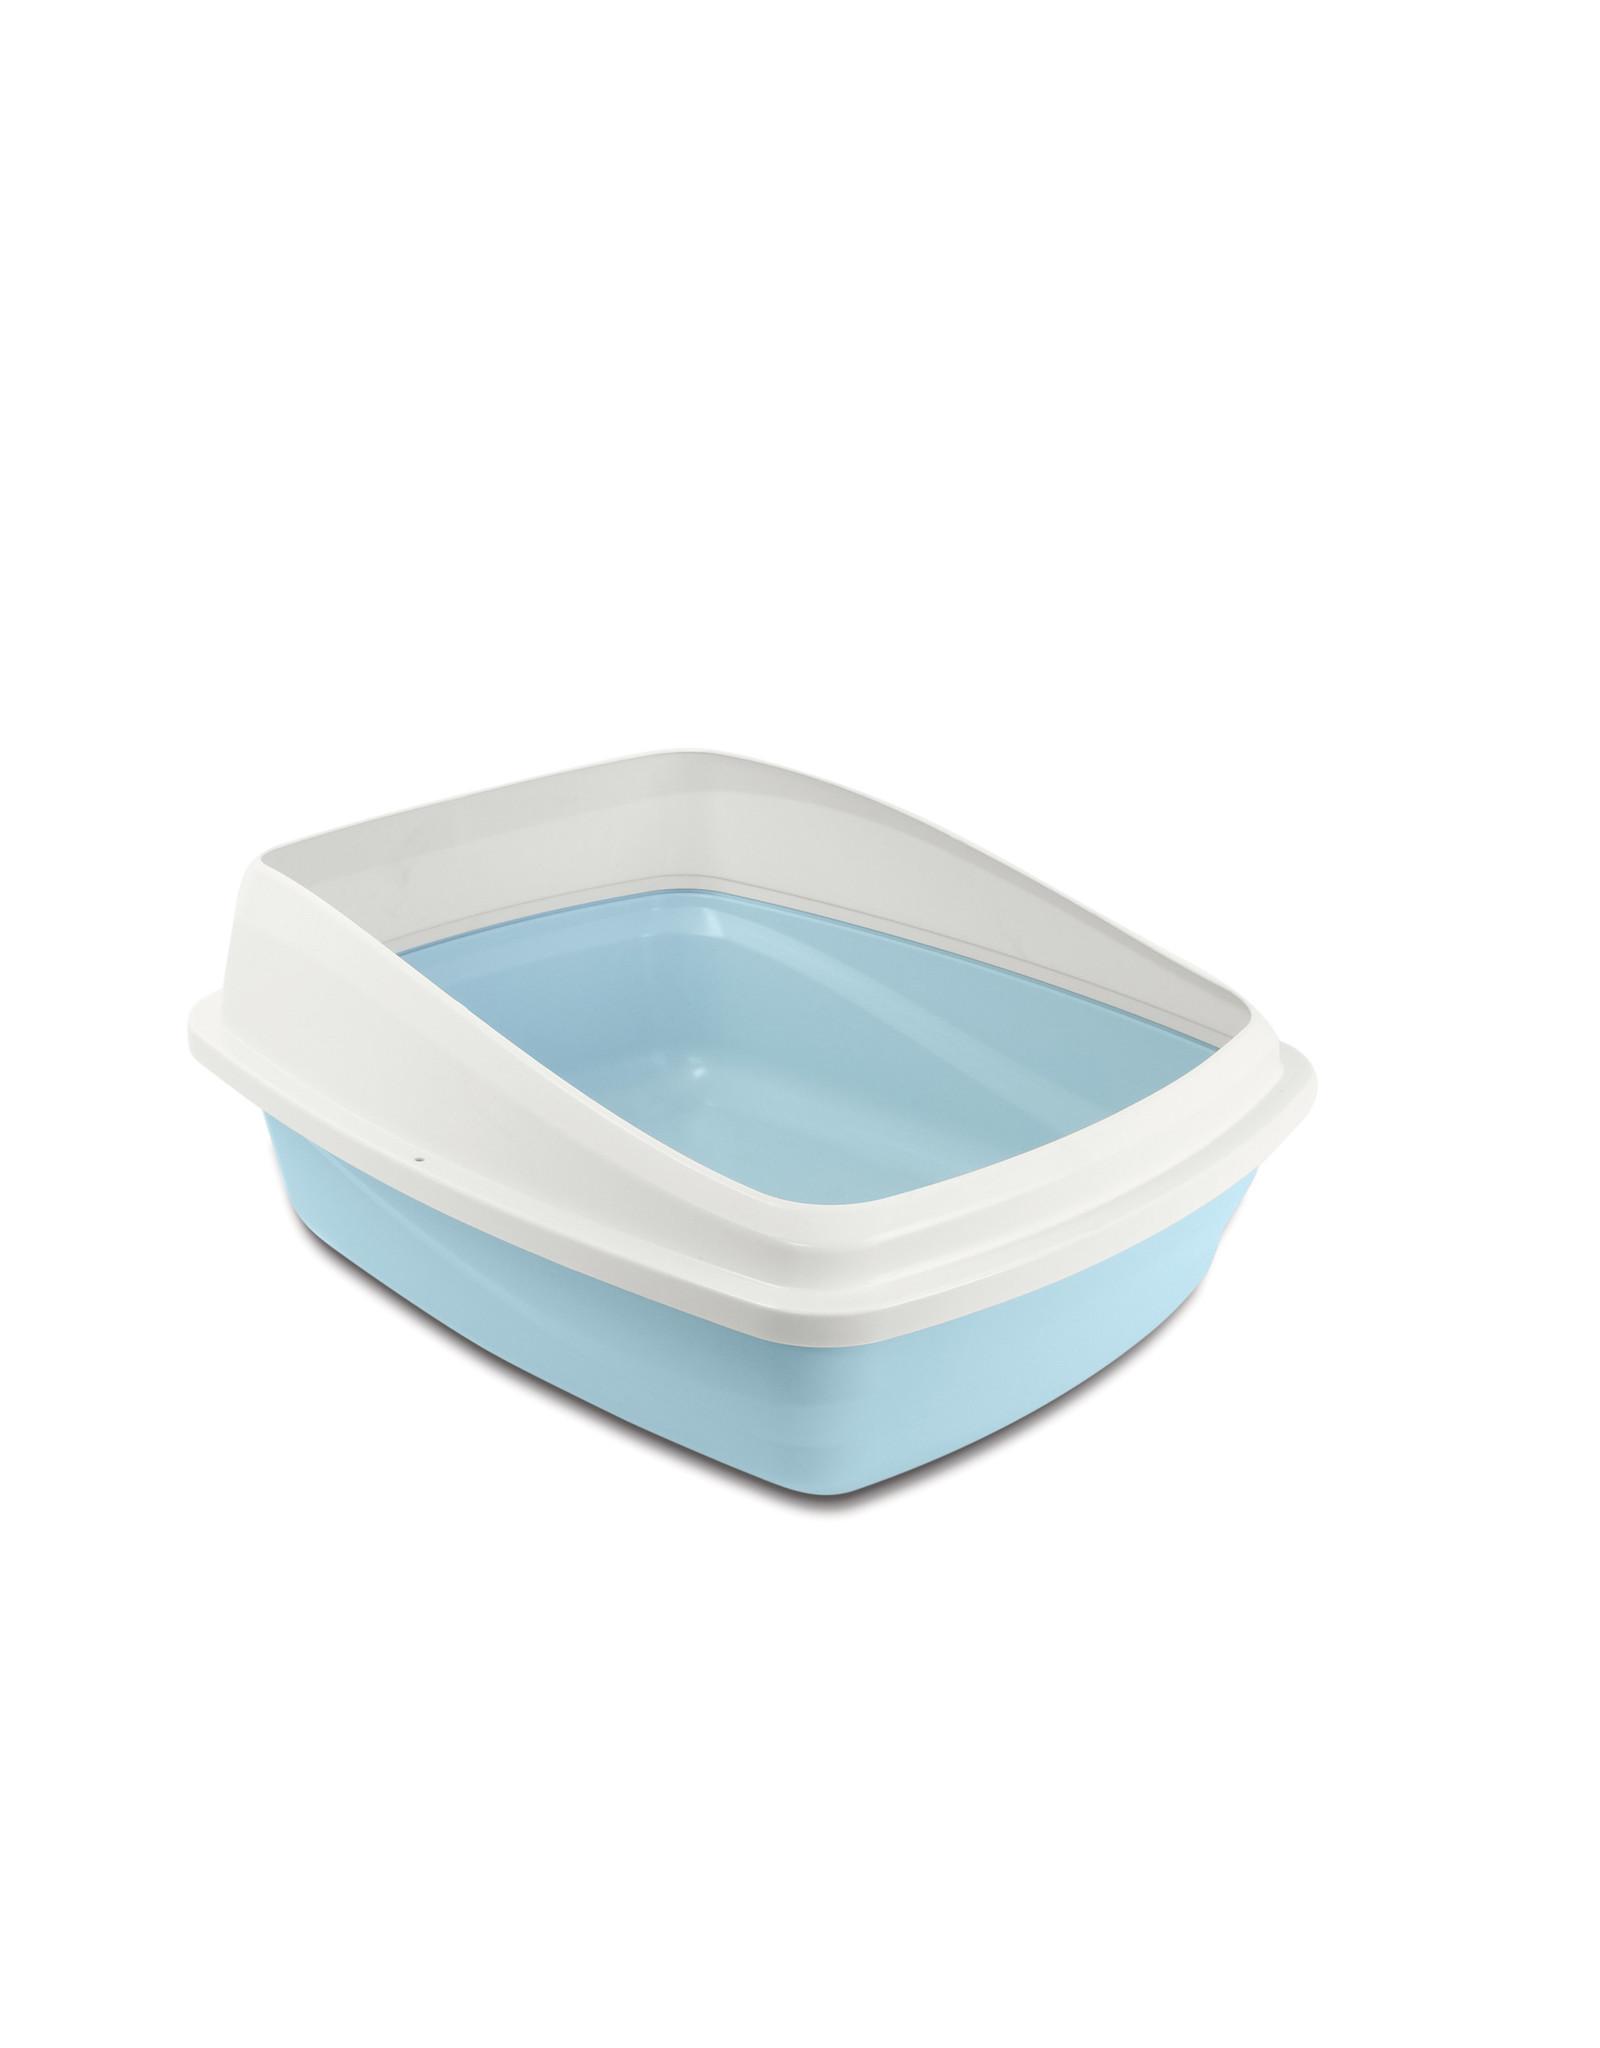 Cat Love Cat Pan with Removable Rim Medium Blue/Grey